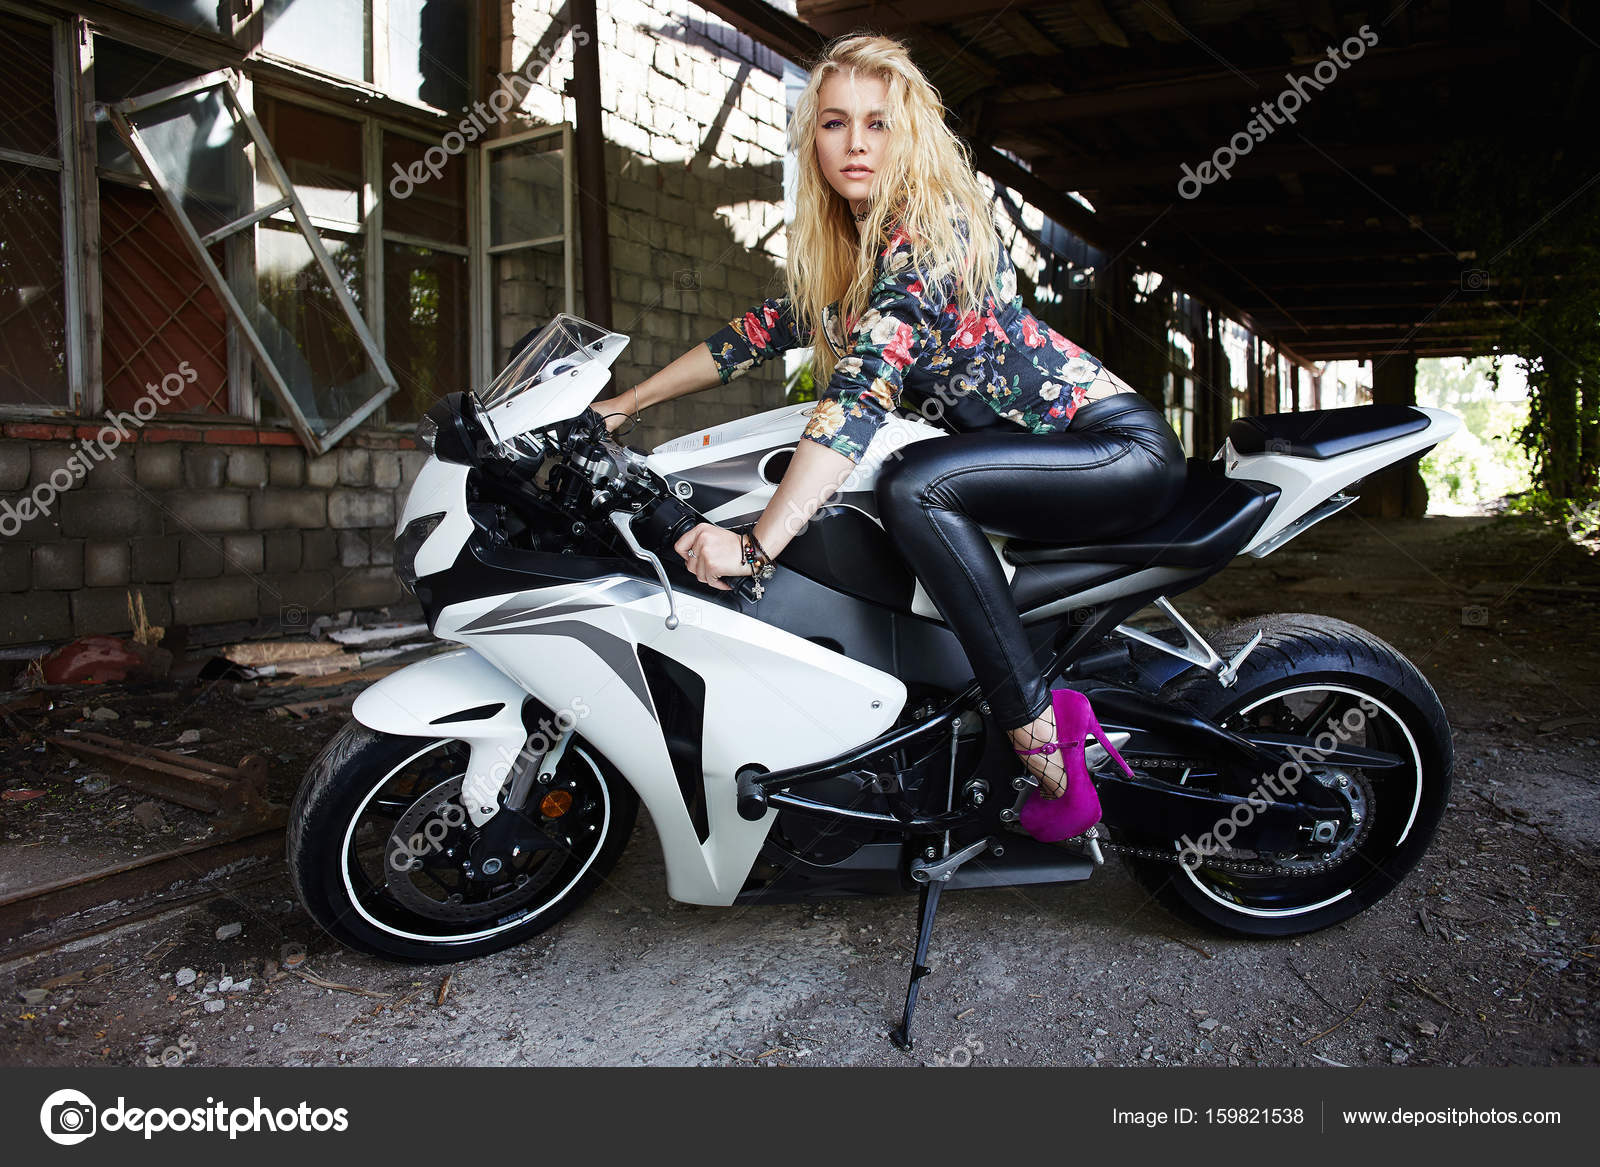 Moda jovem mulher loira de moto esporte stock photo eugenepartyzan 159821538 - Image moto sportive ...